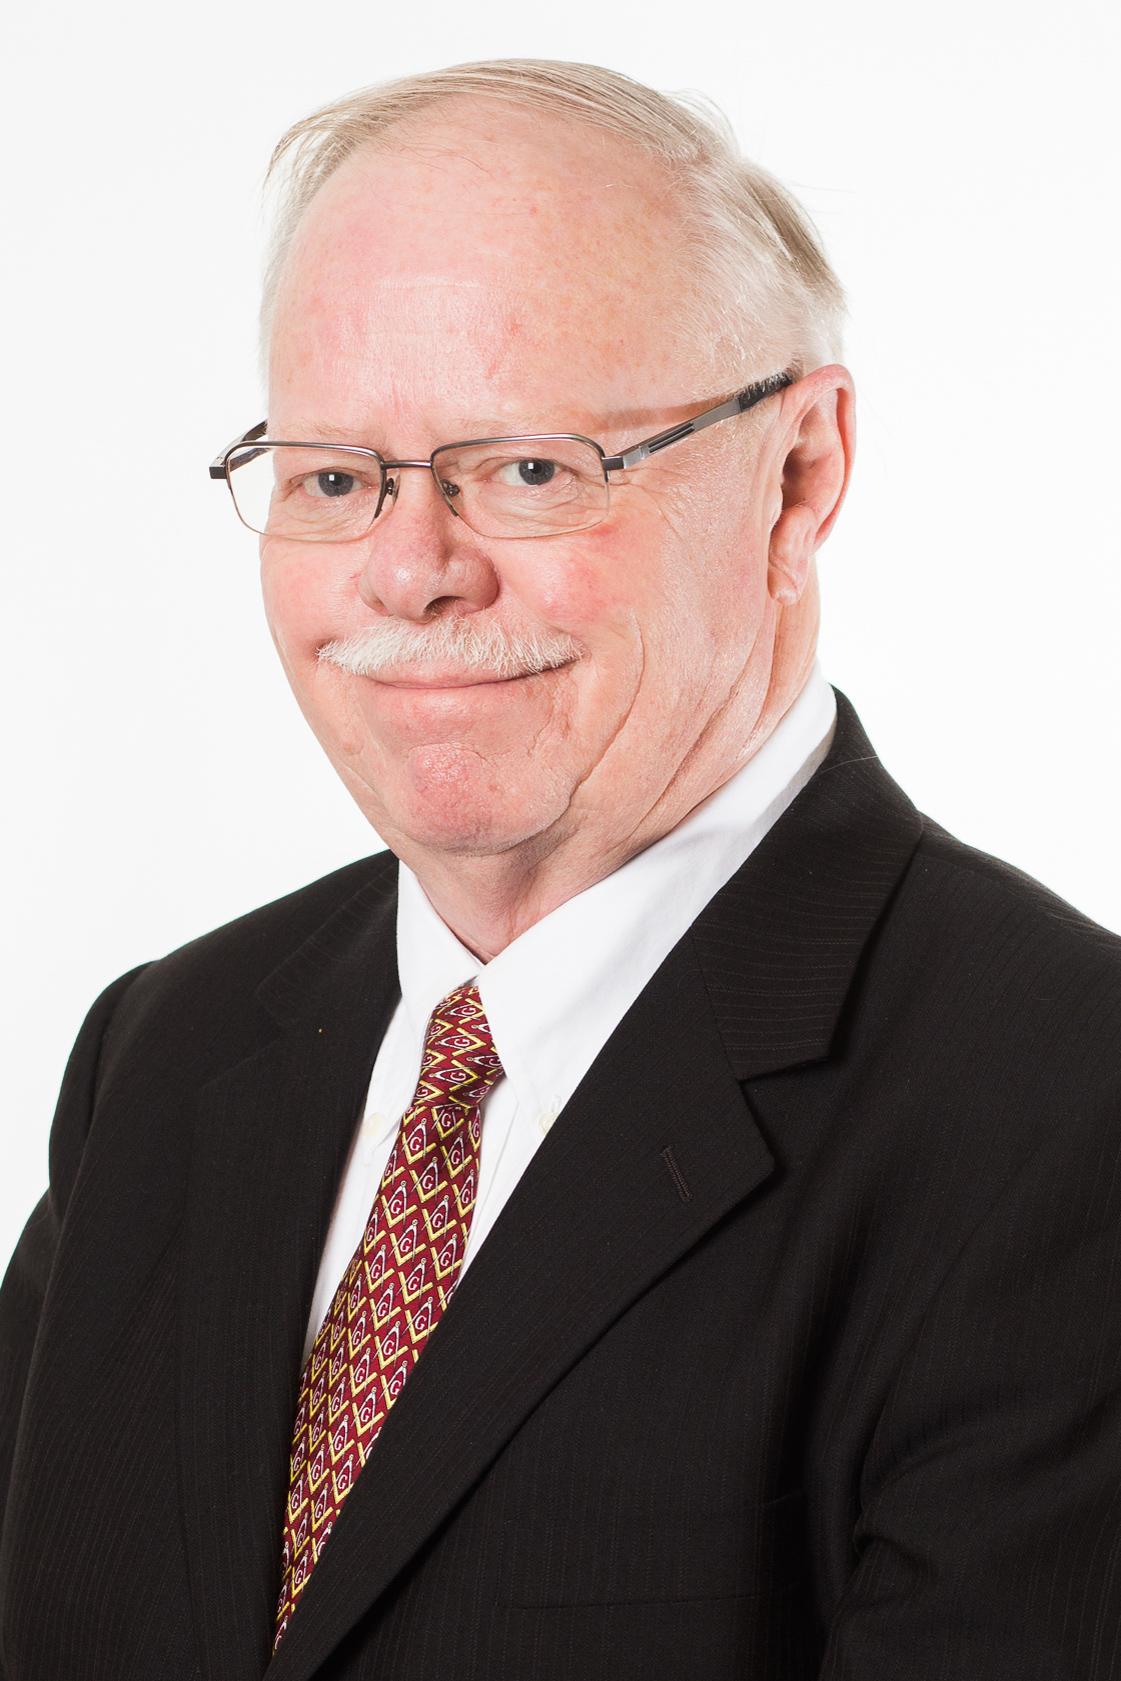 David Storrie